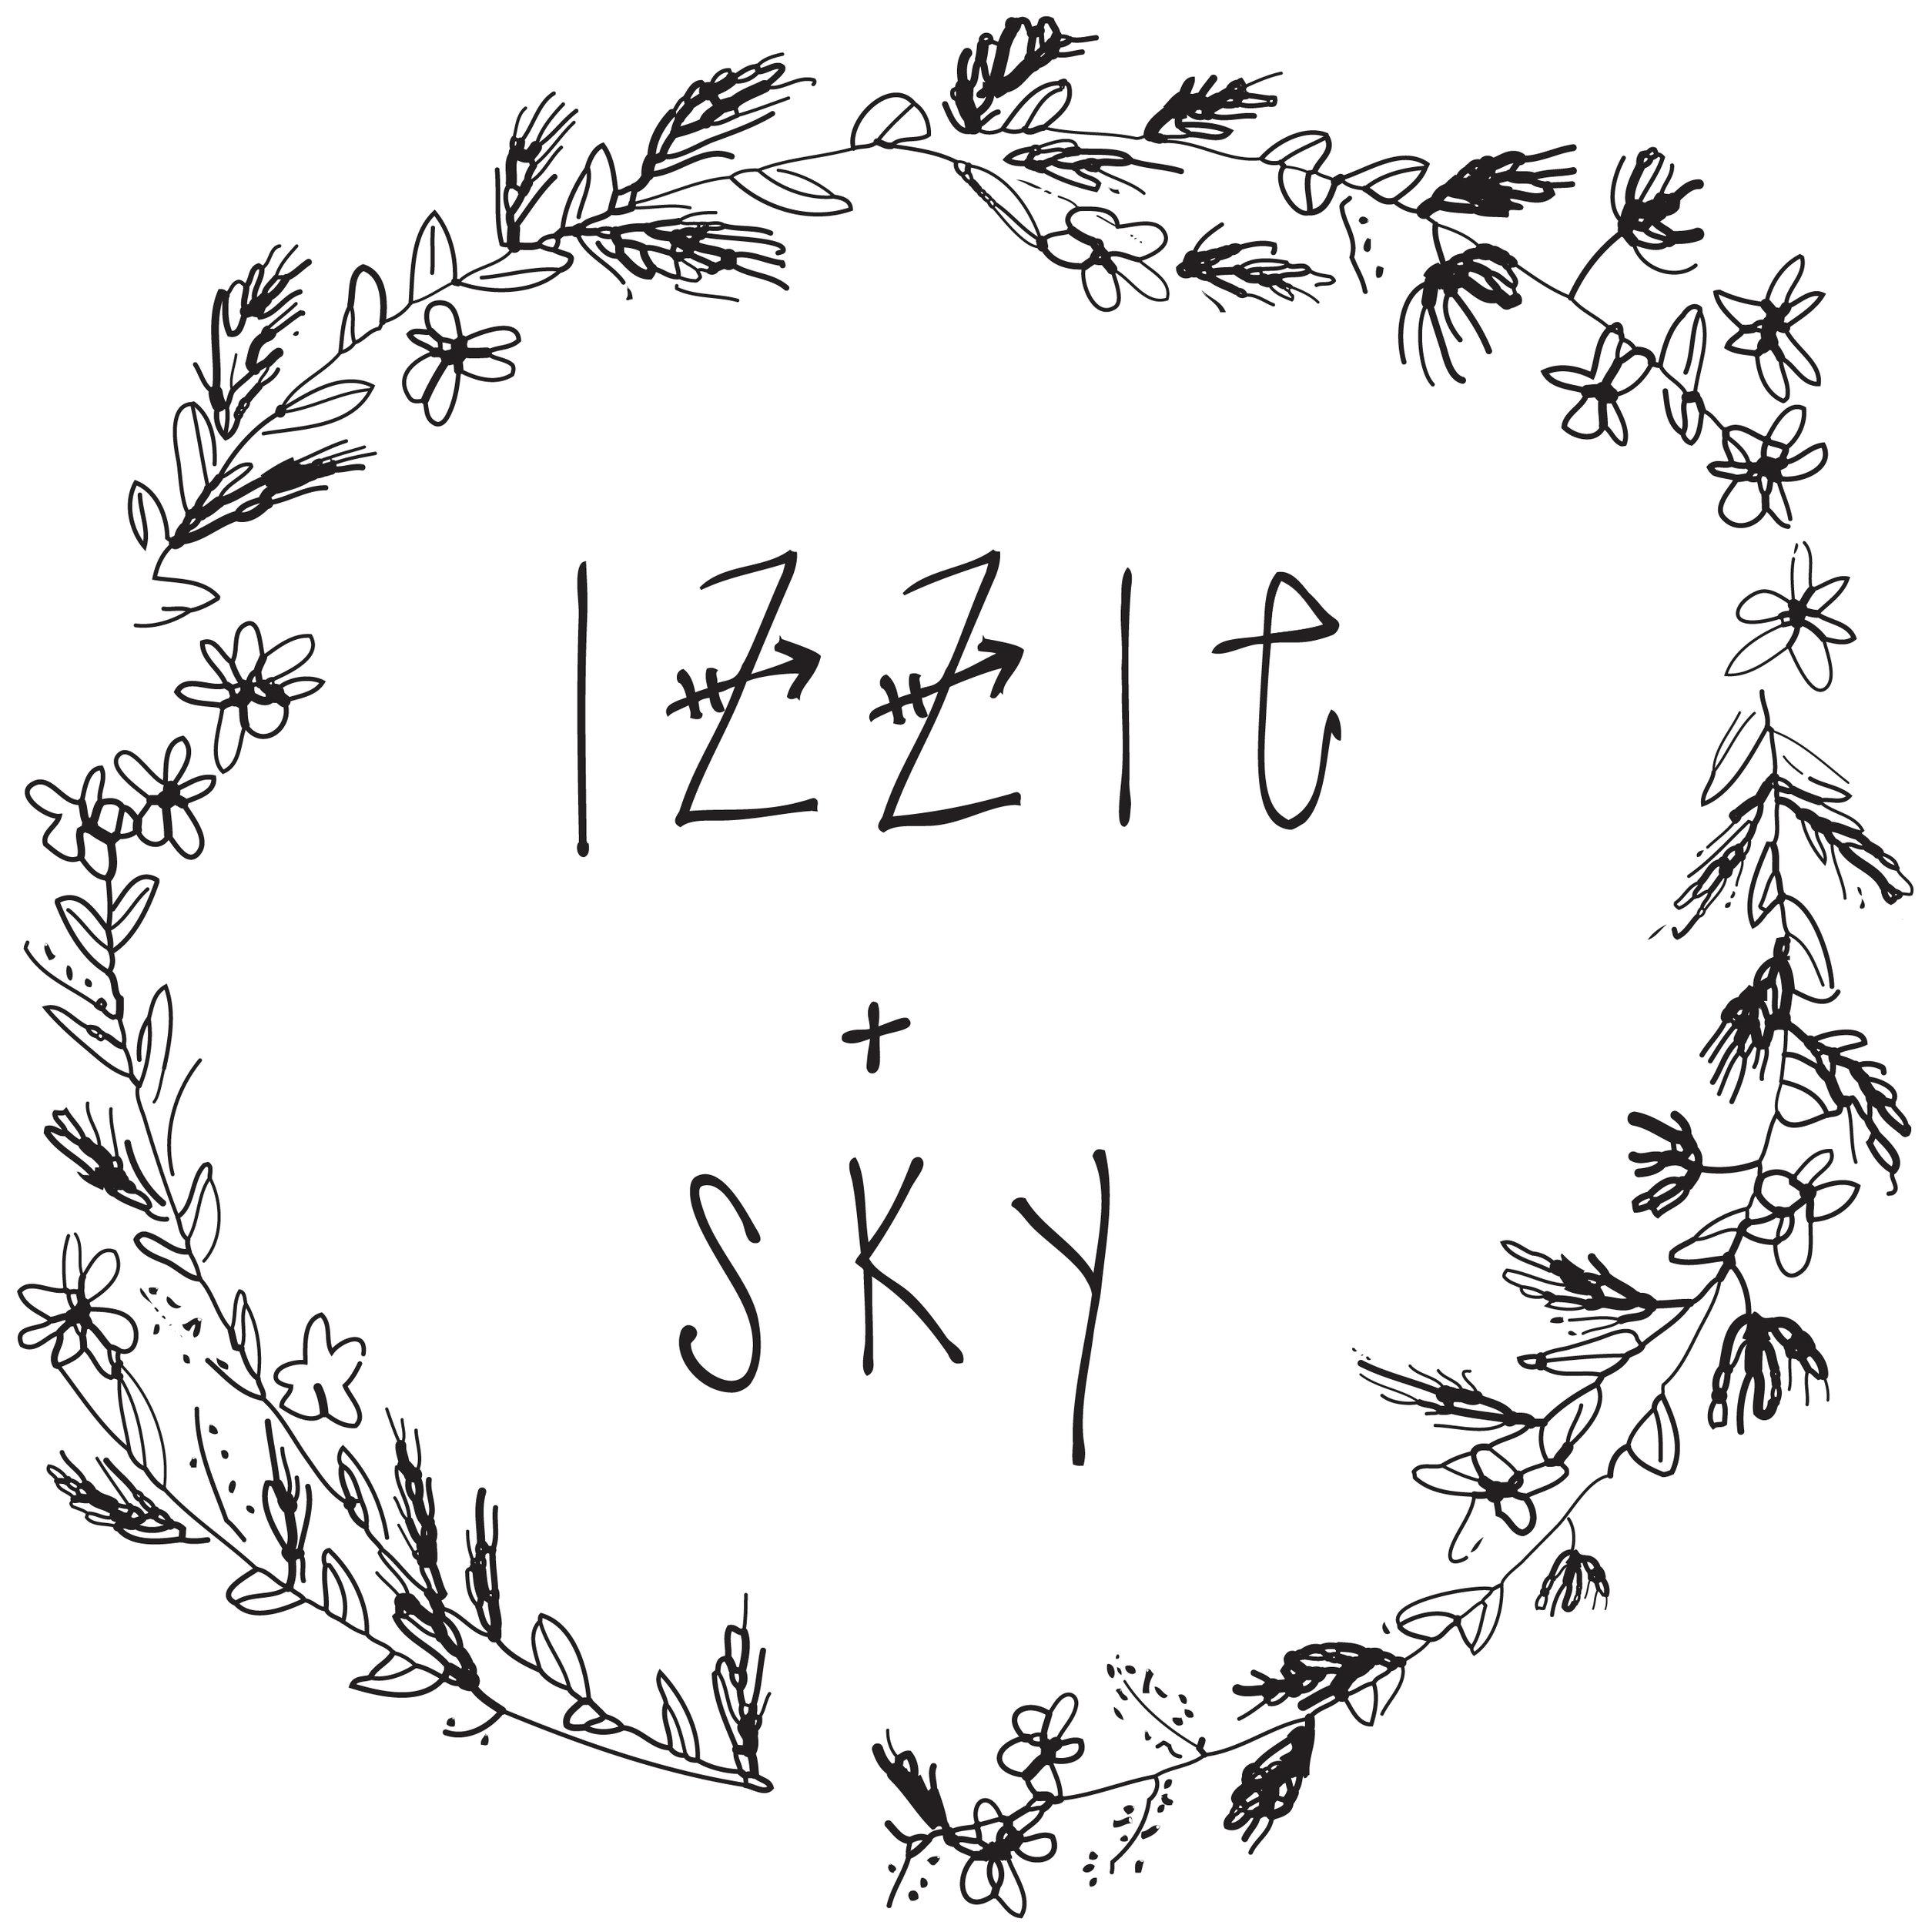 Click our logo to view Izzie + Sky Magazine.